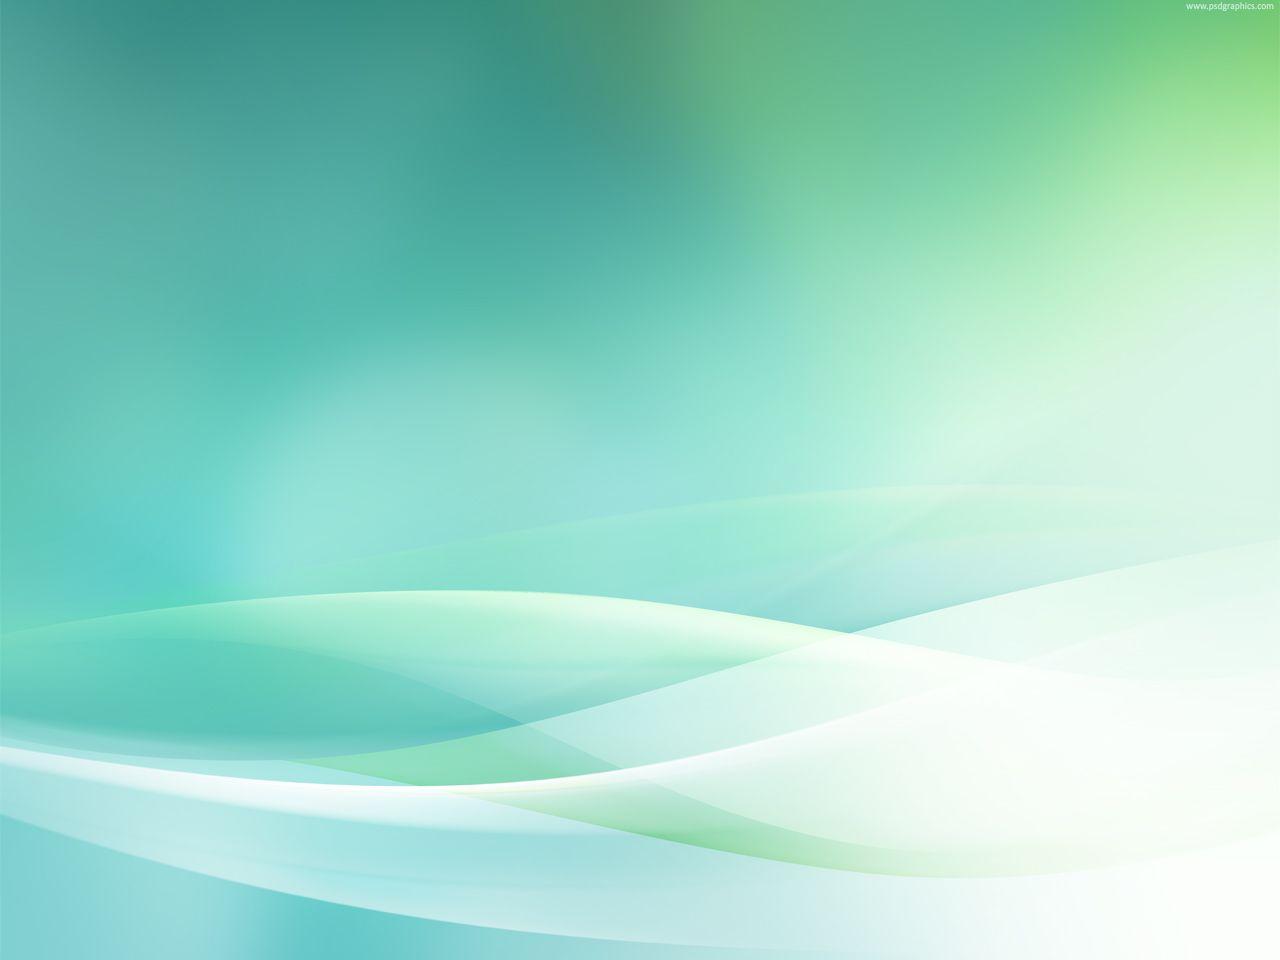 Fresh abstract green background. | ענת | Pinterest | Green ...